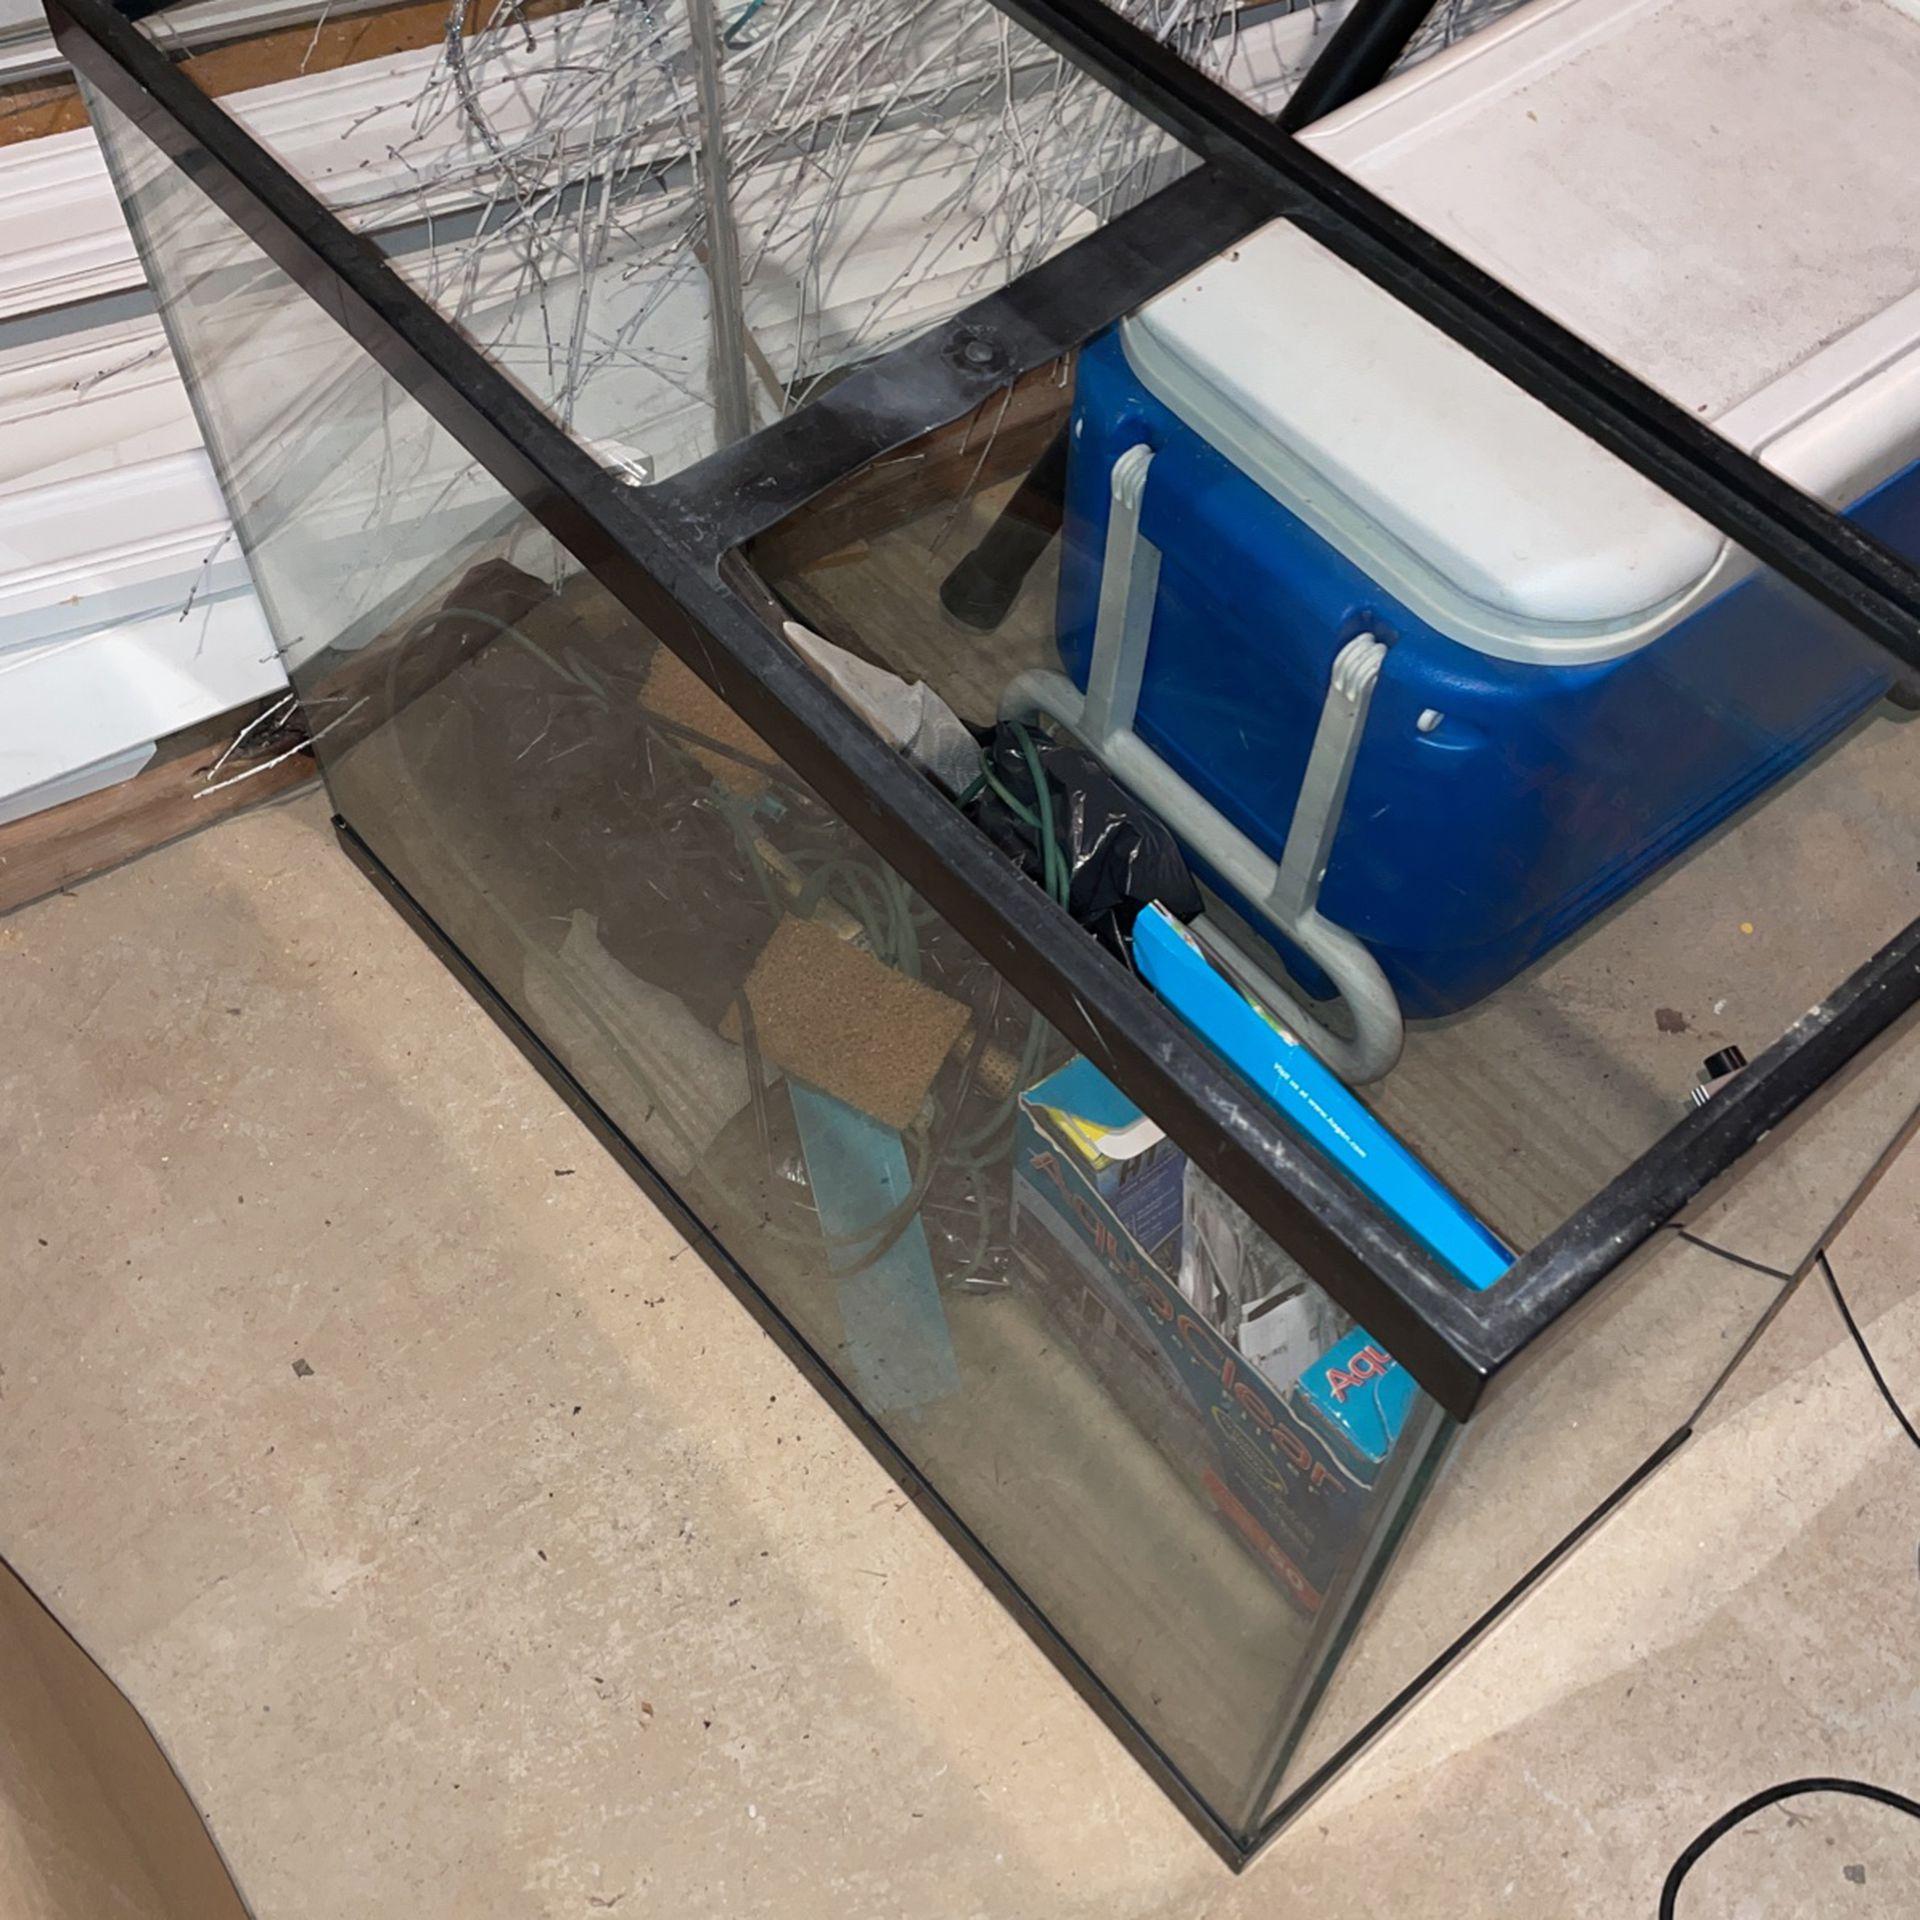 30 Inch Fish tank